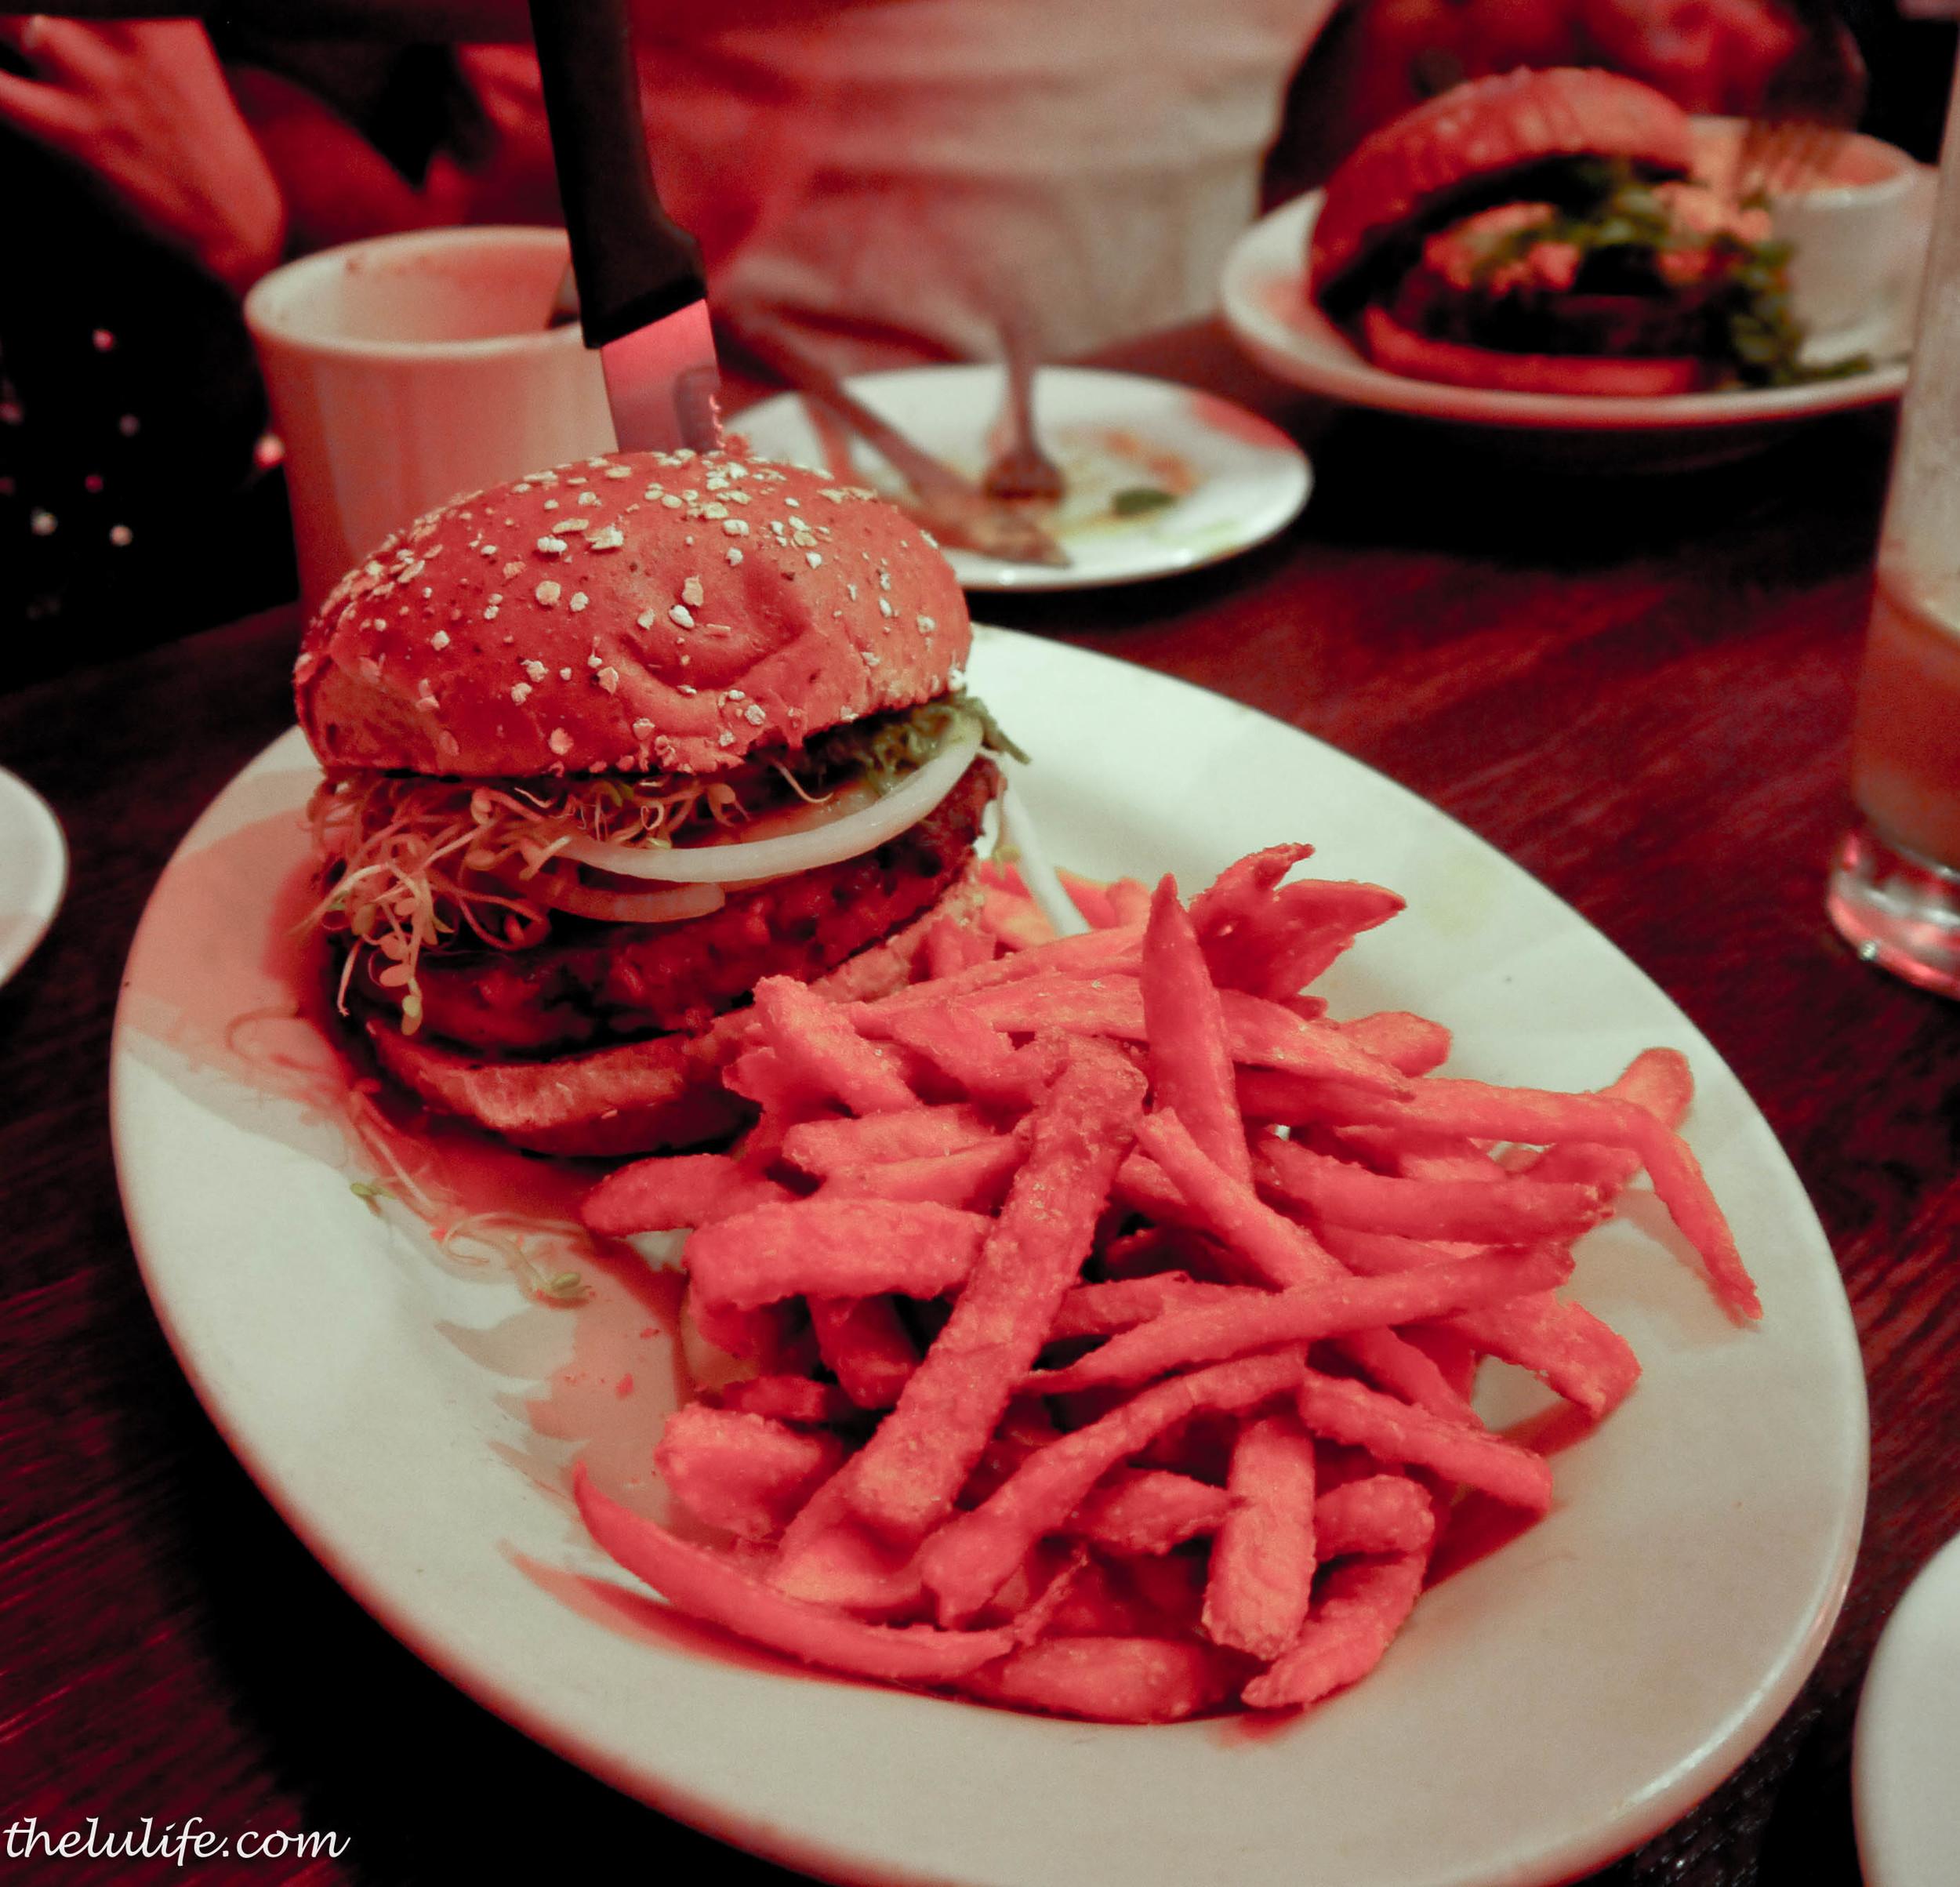 Buddha's Karma Burger - curried sweet potato tofu patty, grilled pineapple, lettuce, onion and chimichurri sauce